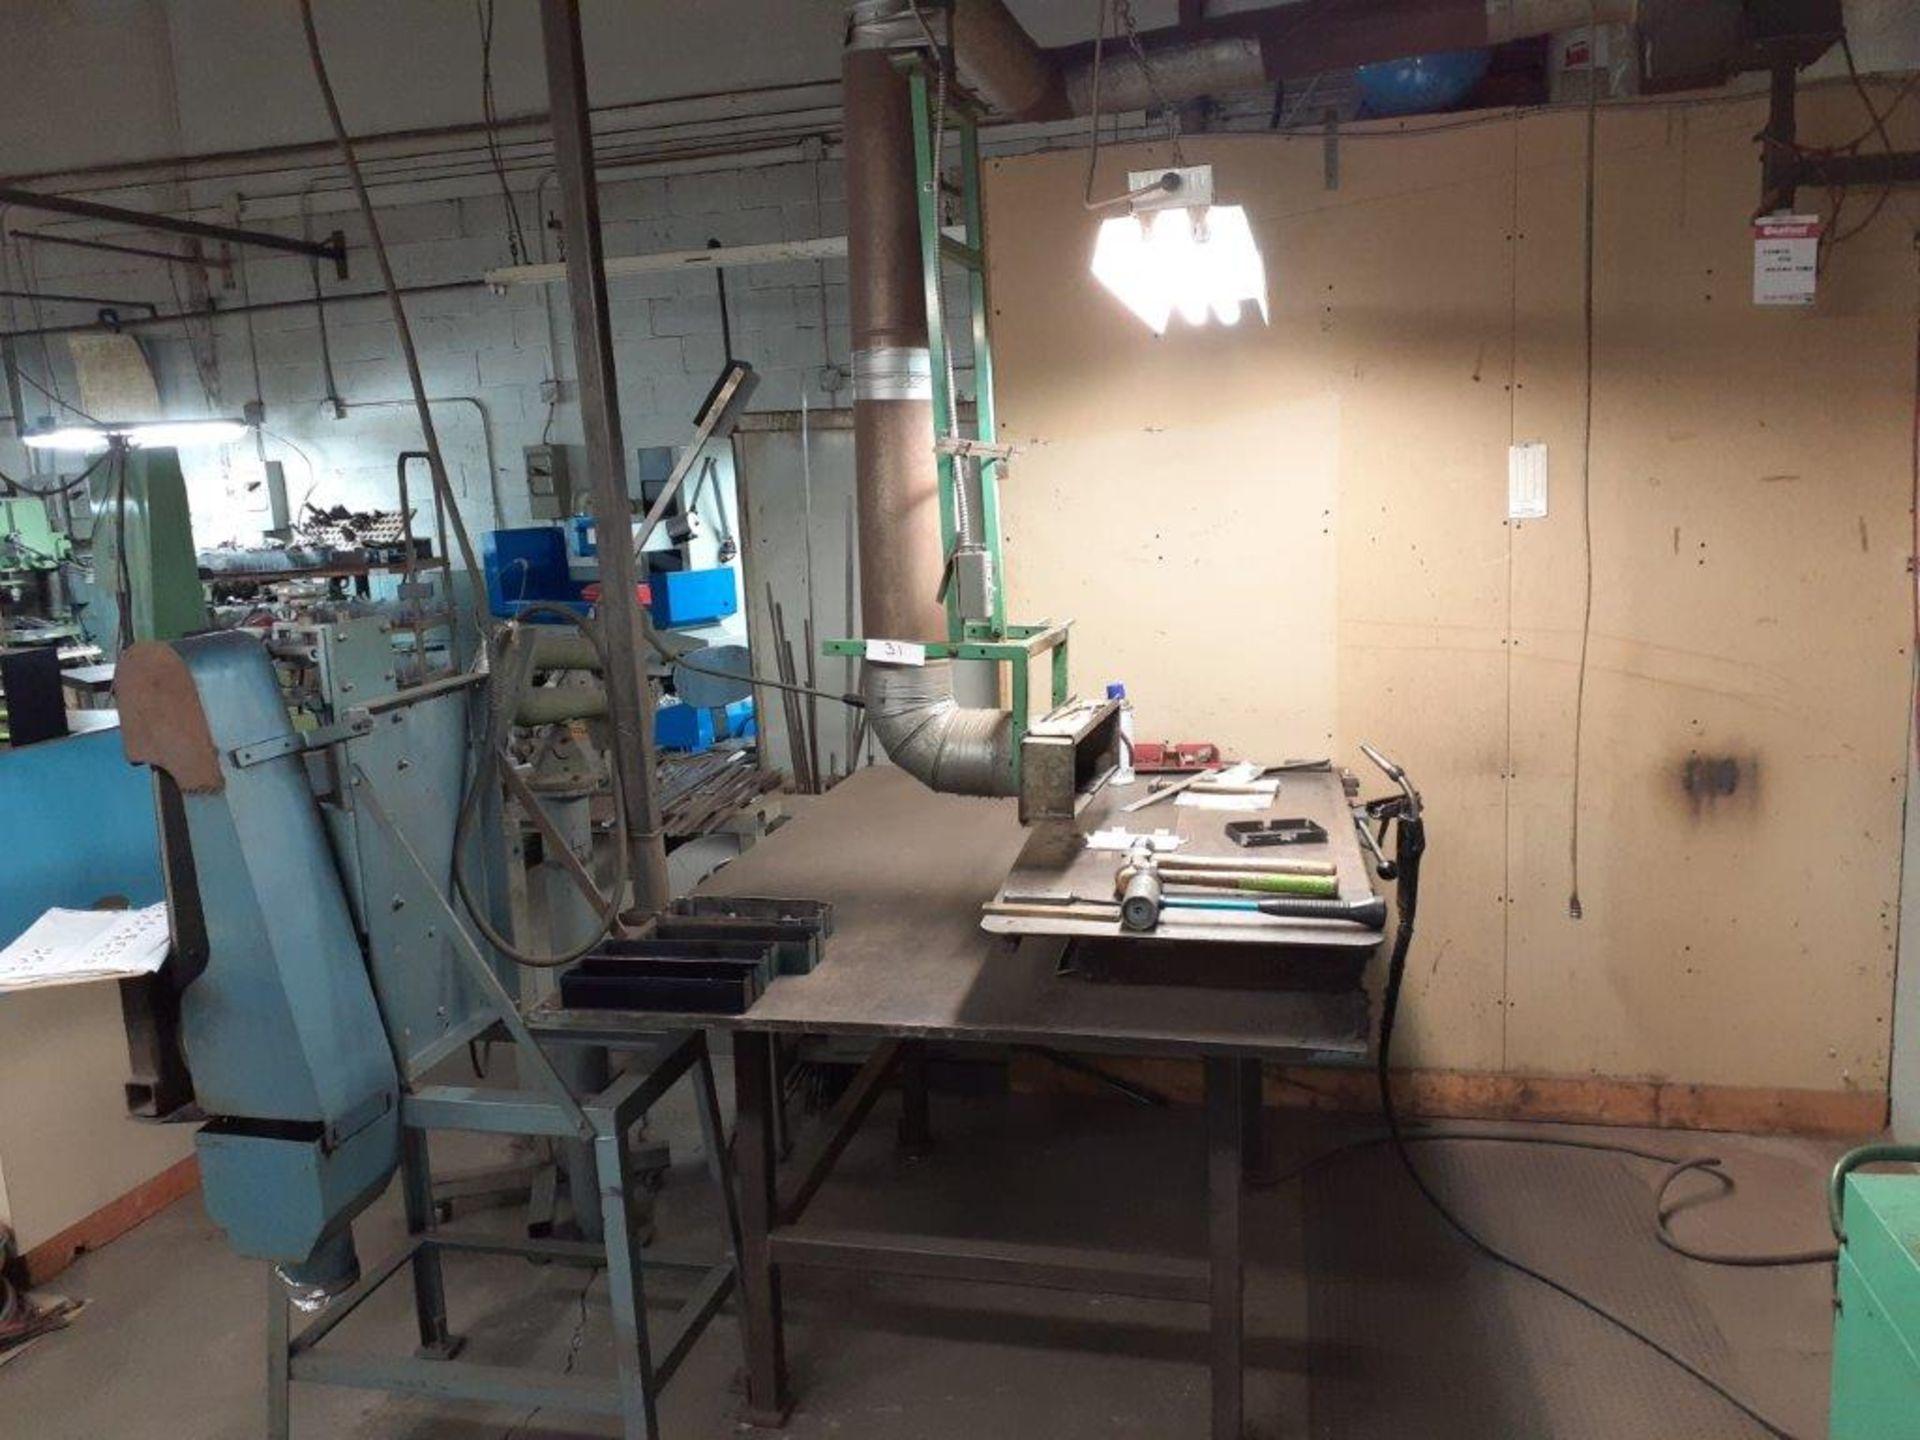 "Magnetic Welding Chuck, 22"" x 12"" c/w Extension: 44"" x 22"" & Exhaust Hood c/w Tools & Accessories"